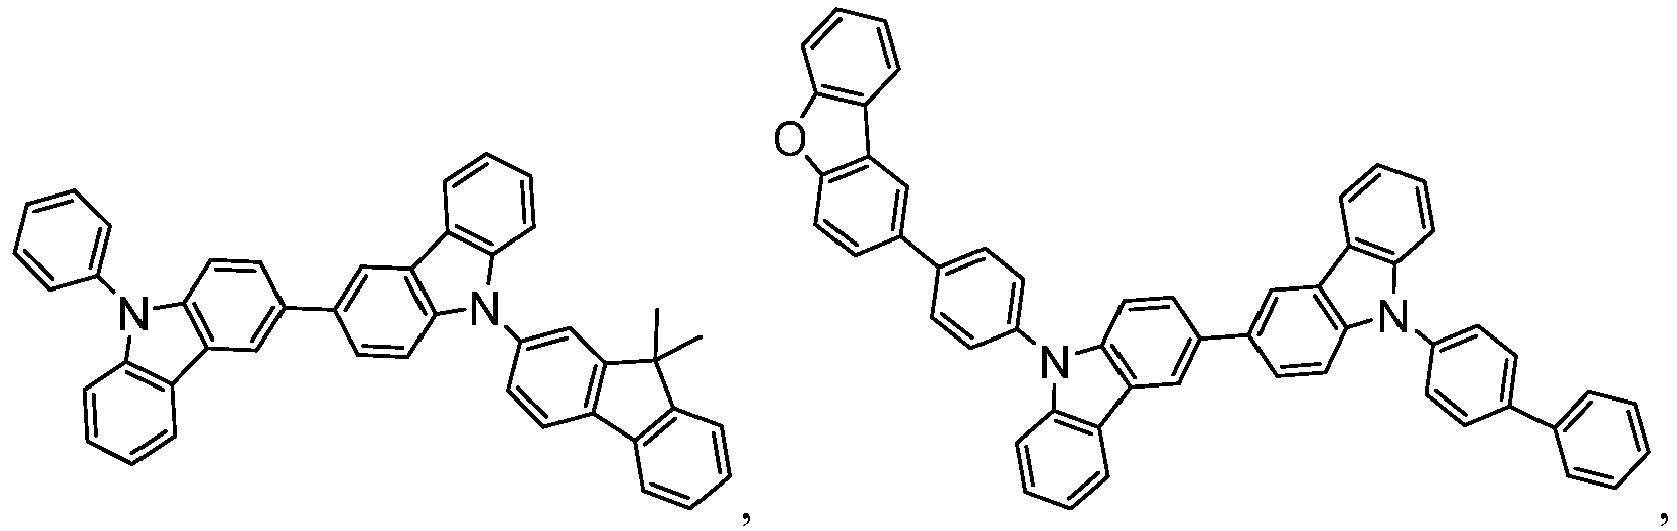 Figure imgb0896